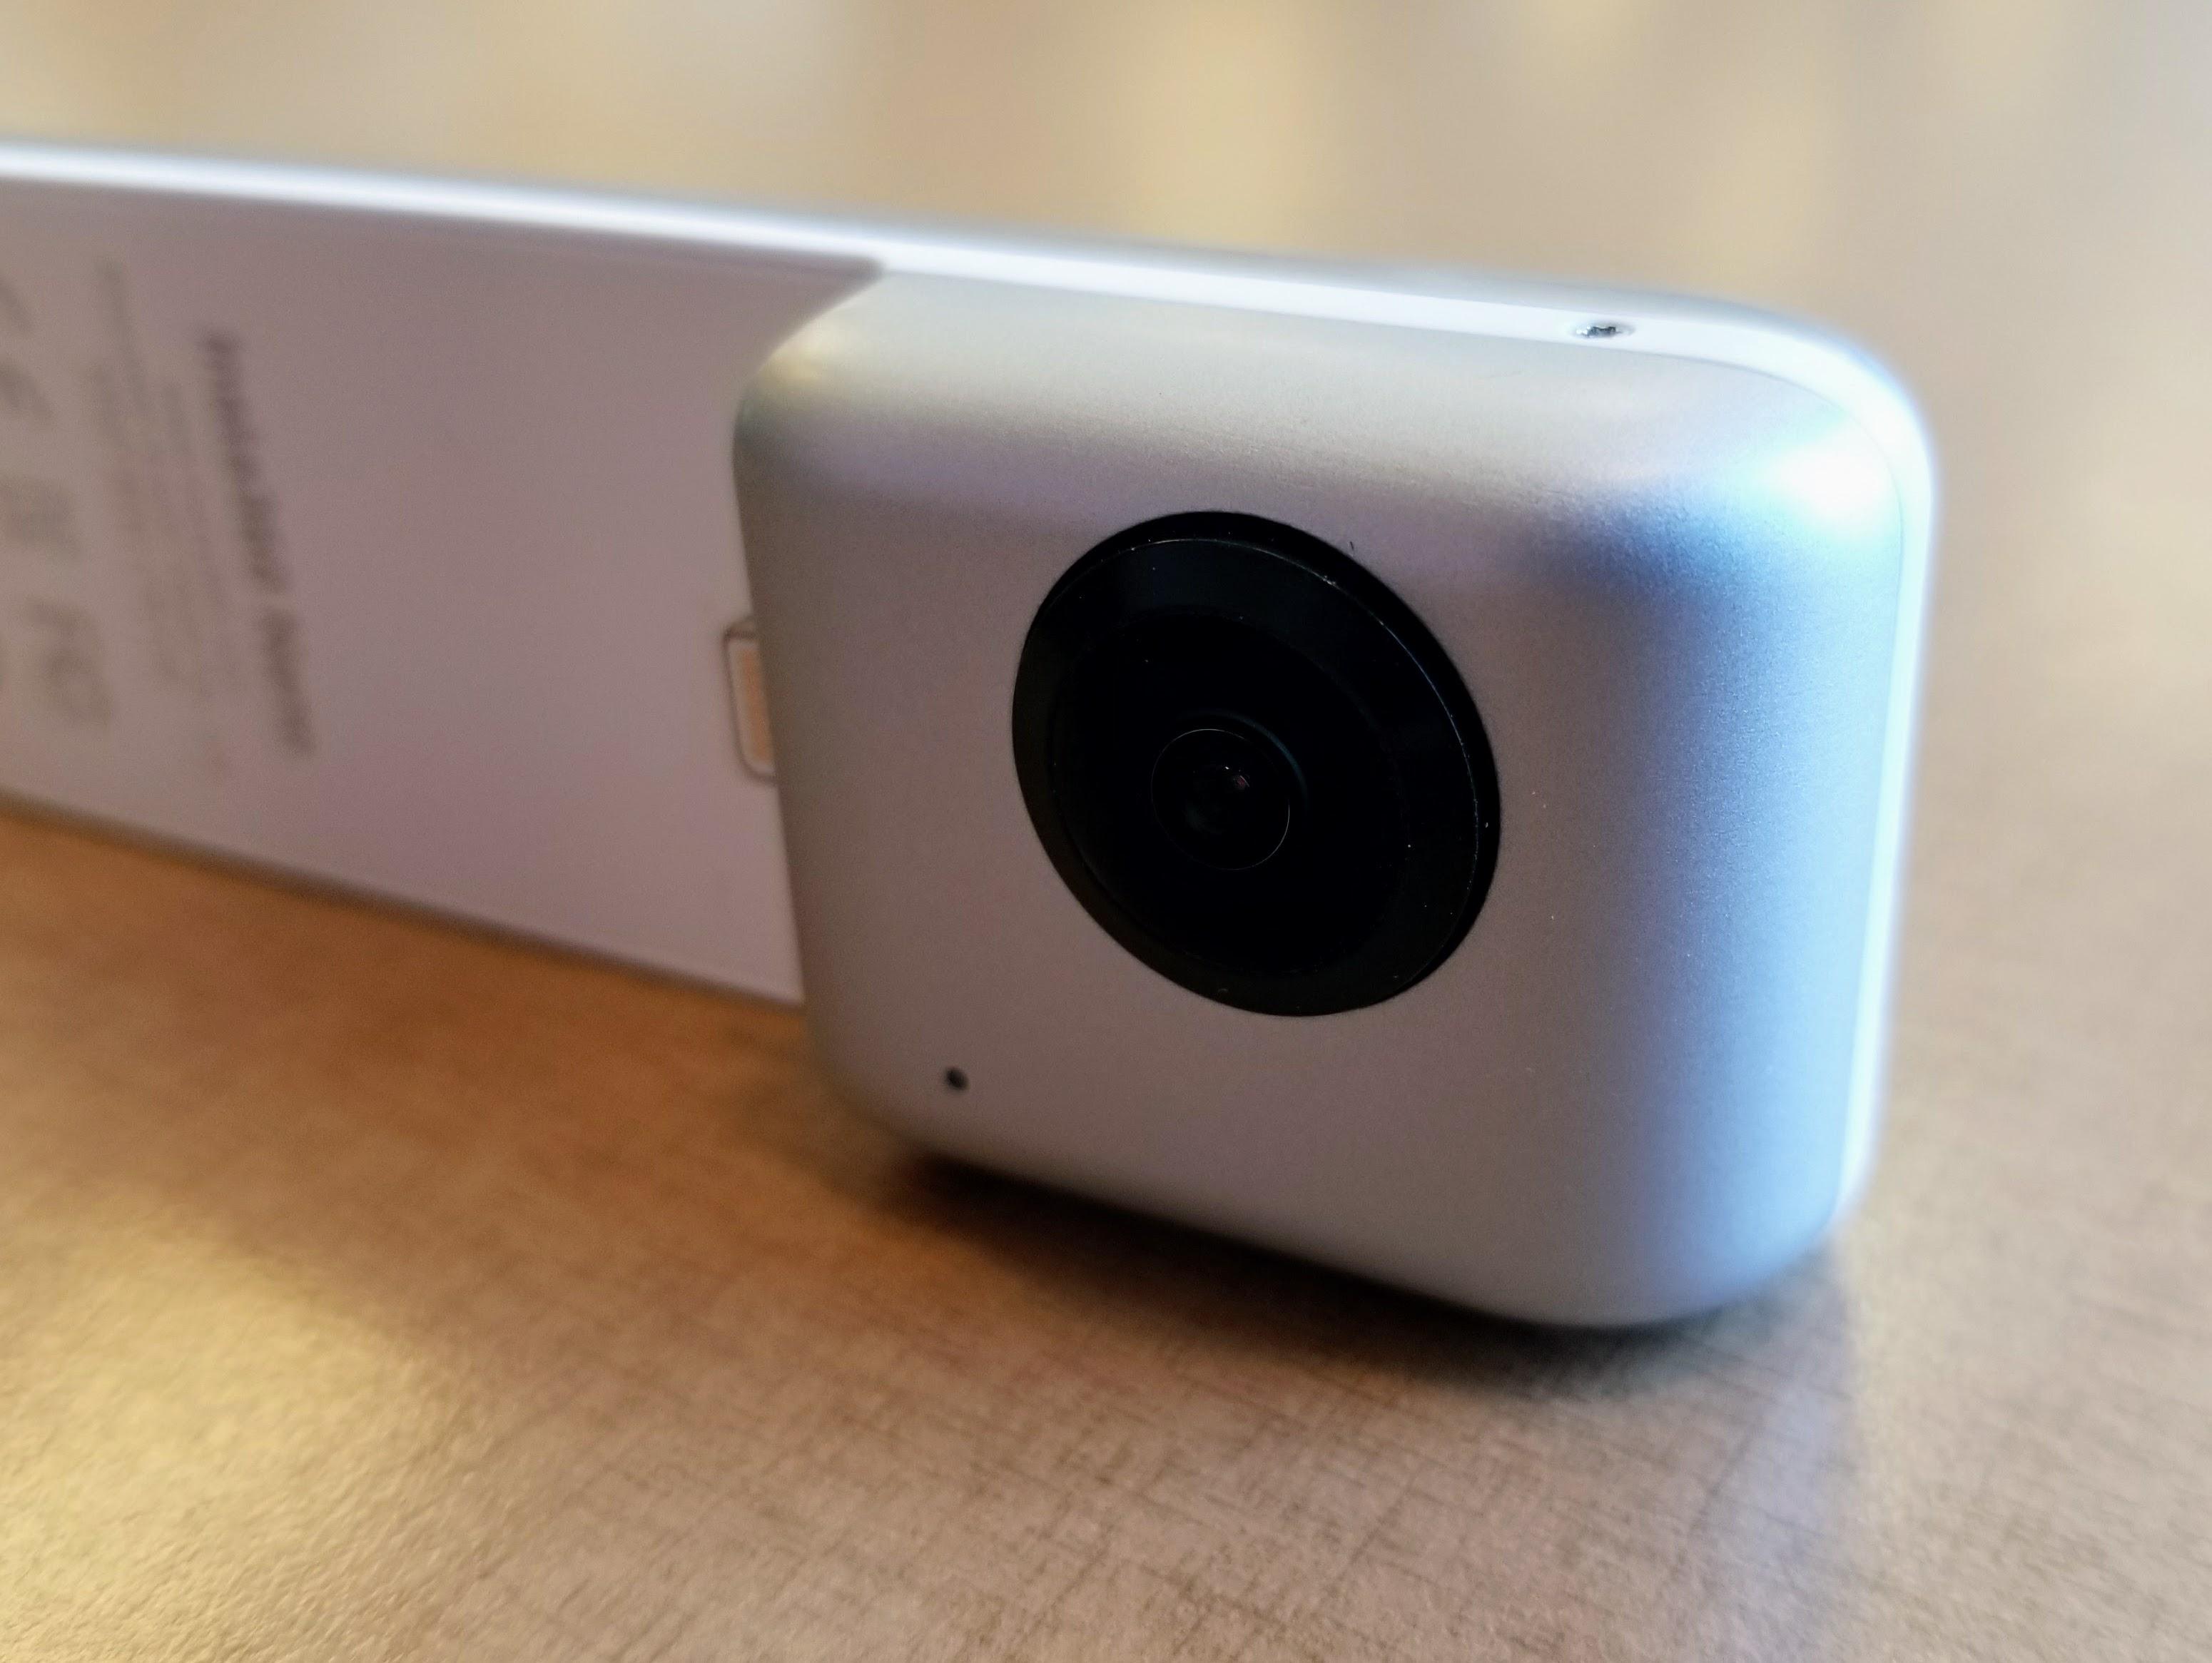 isnta360 nano for iphone camera